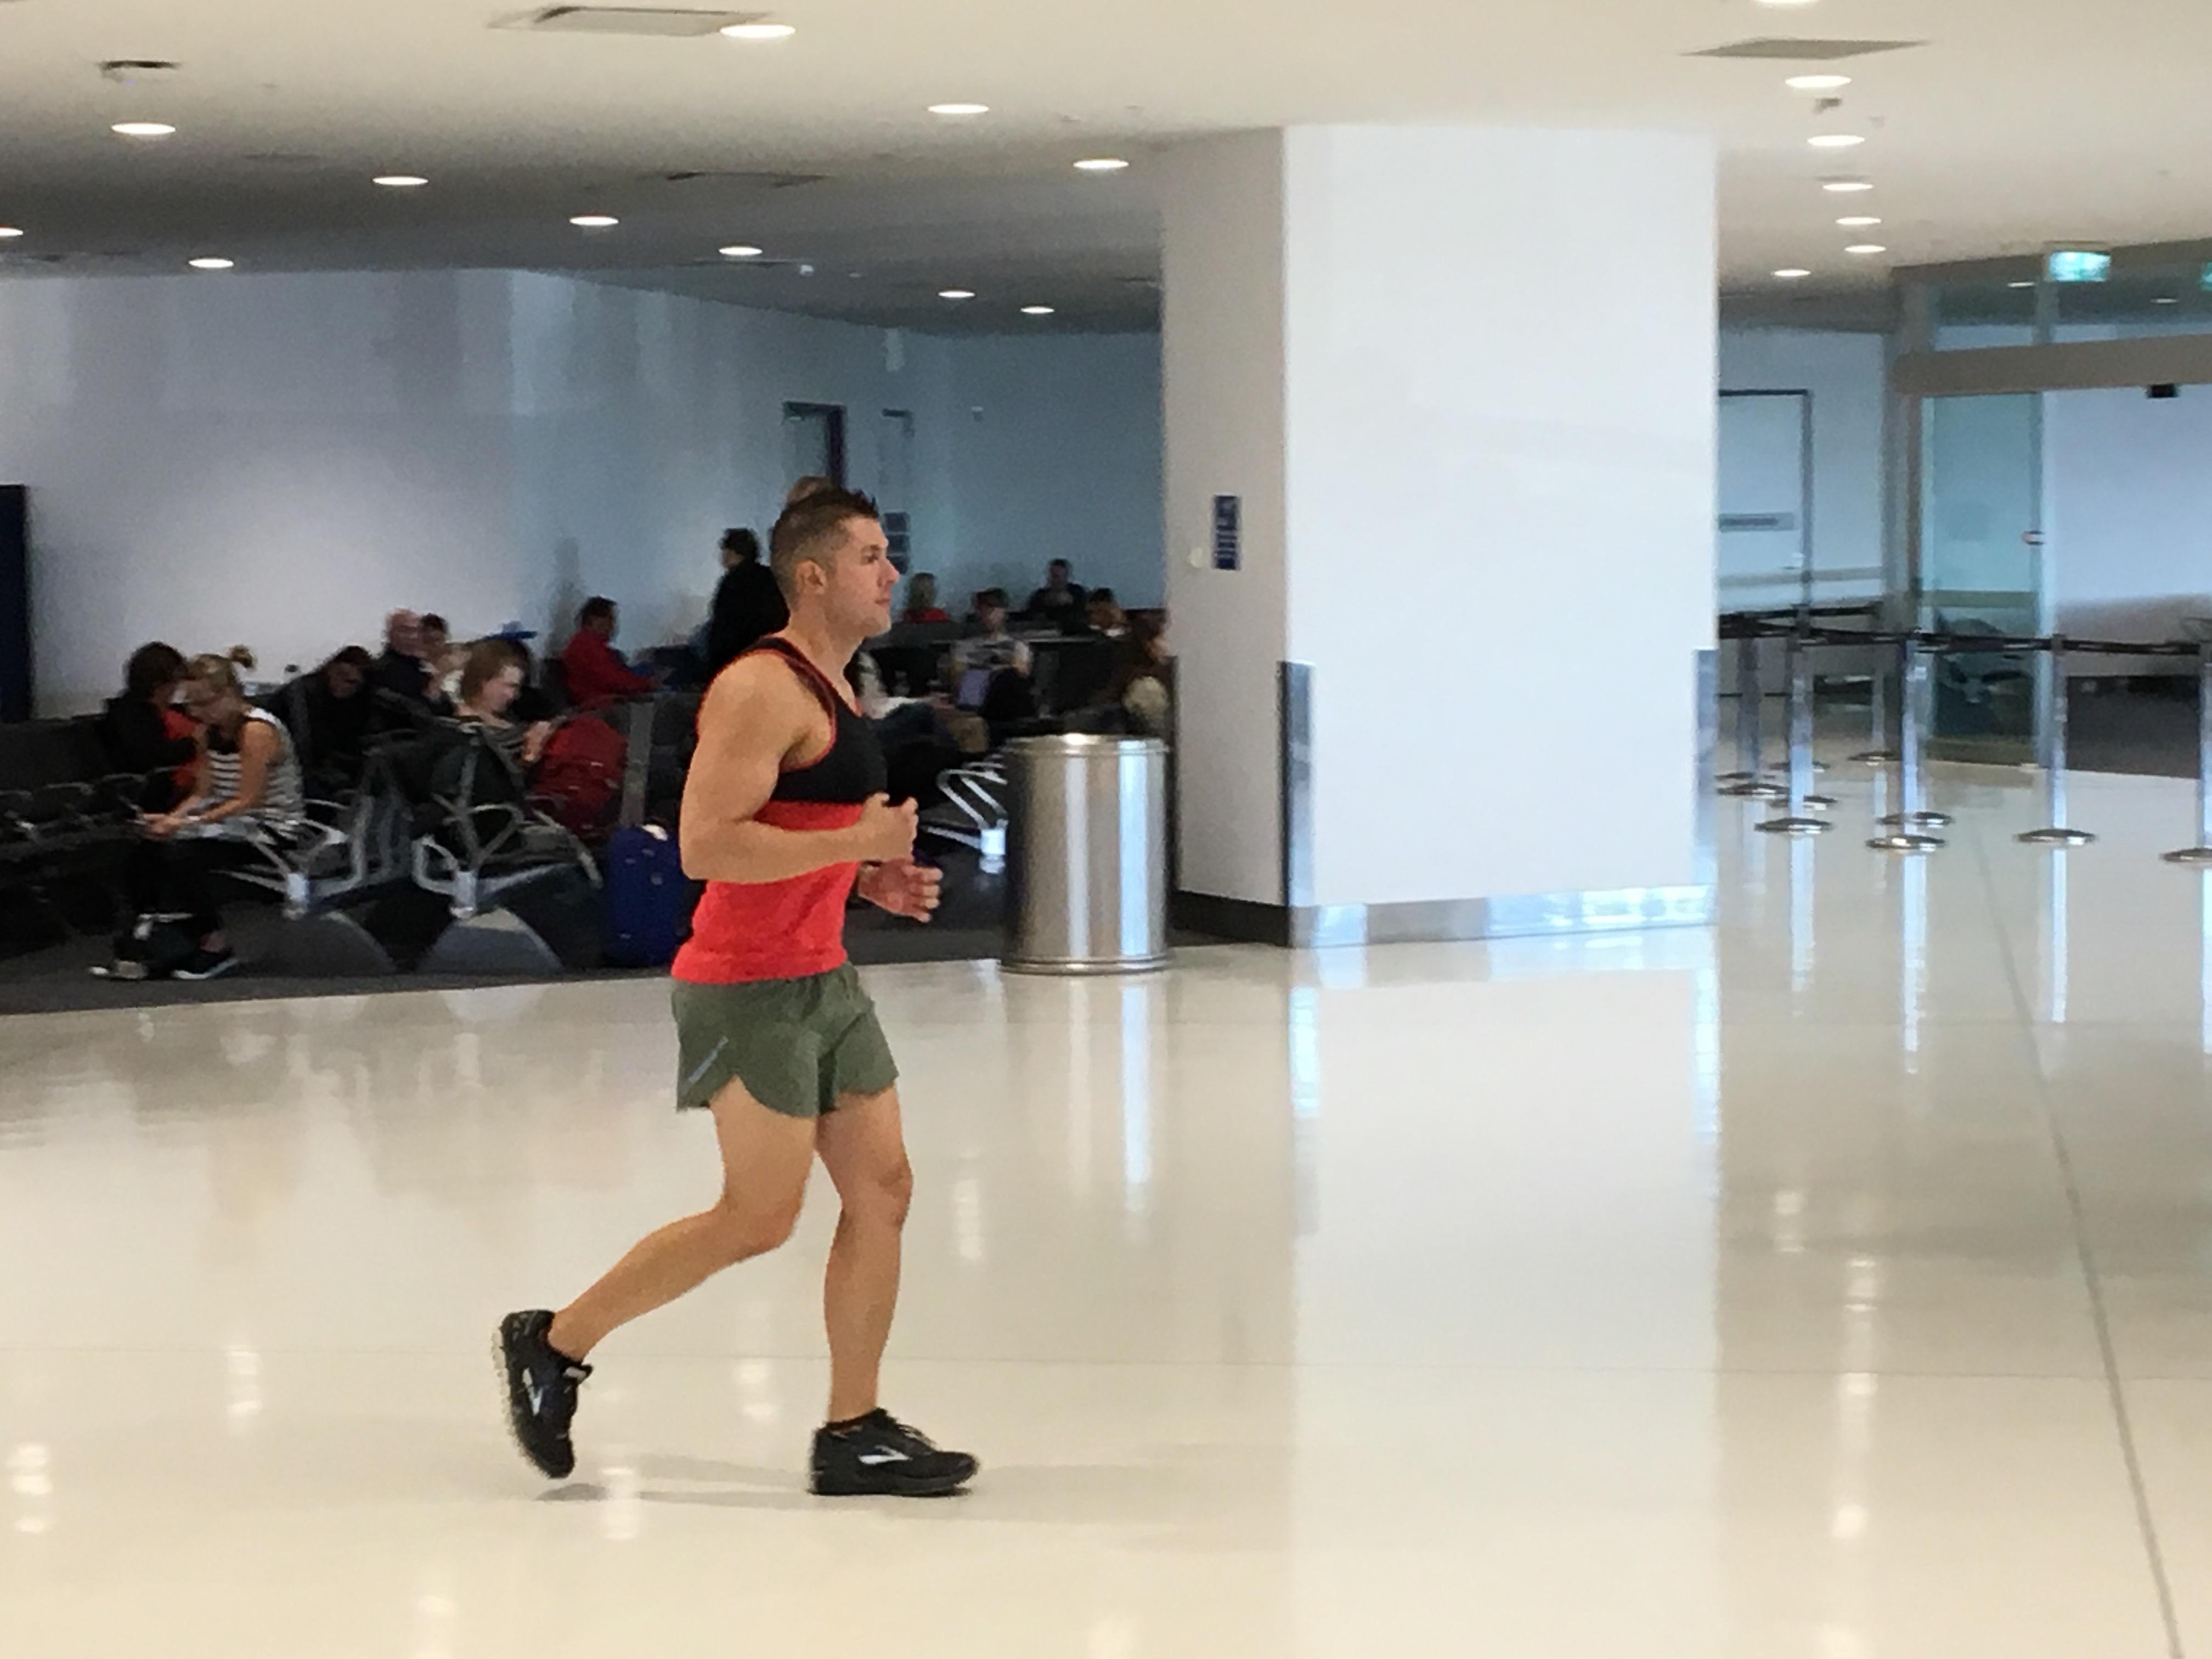 Photo: Airport Exercise Book Ken Seifert